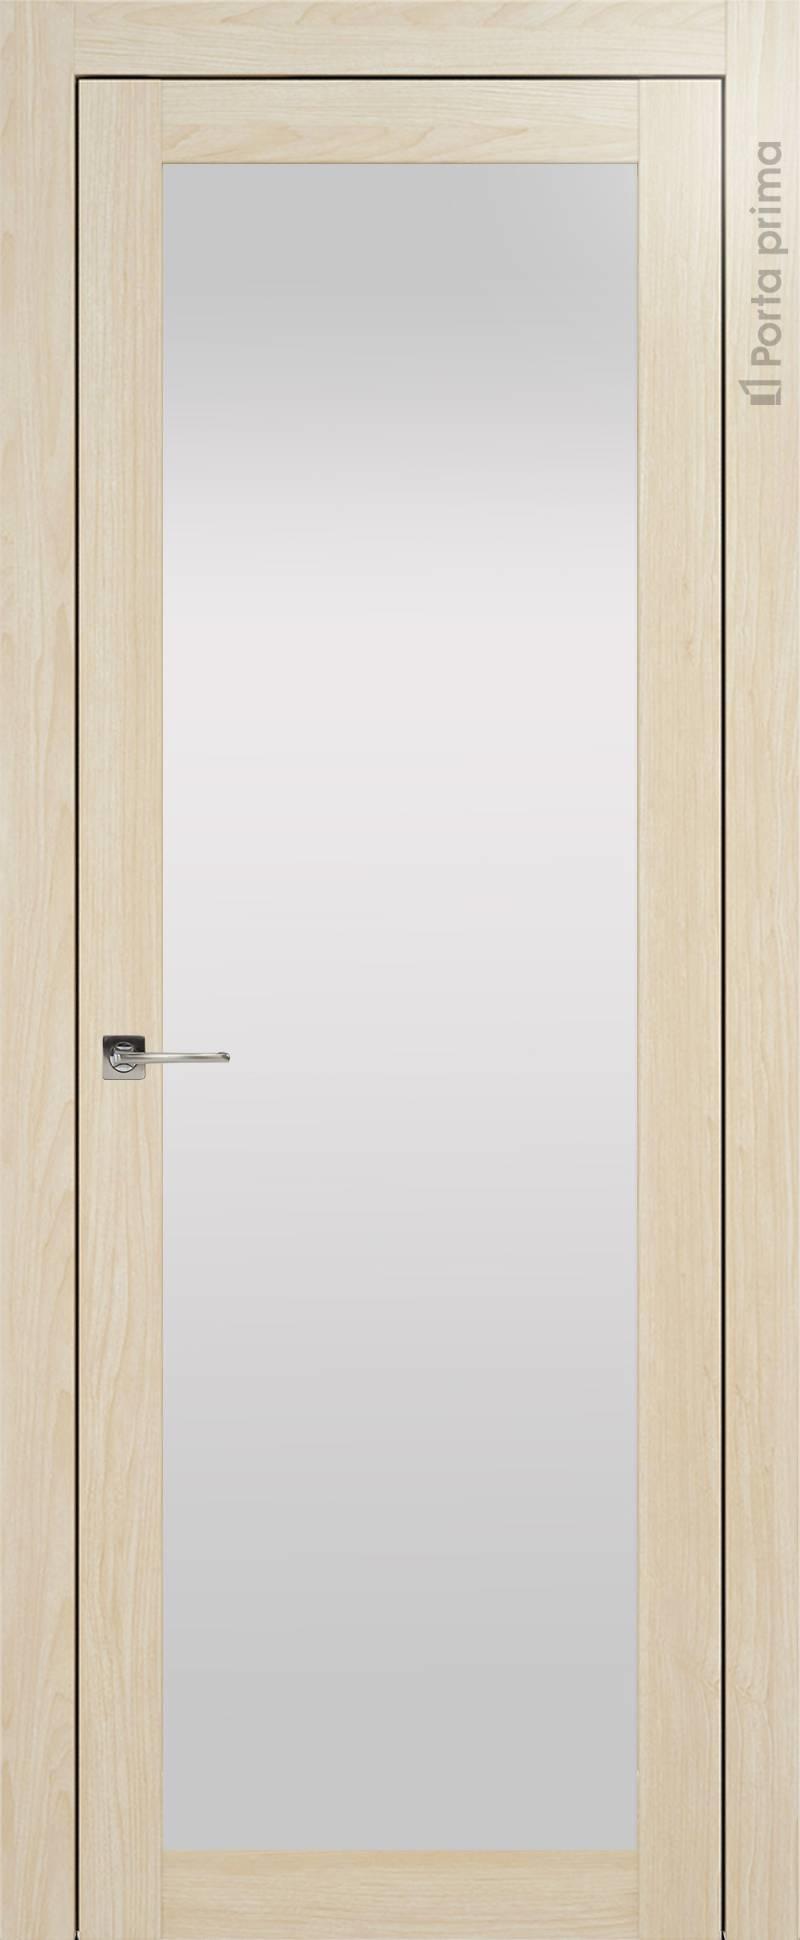 Tivoli З-1 цвет - Клен Со стеклом (ДО)